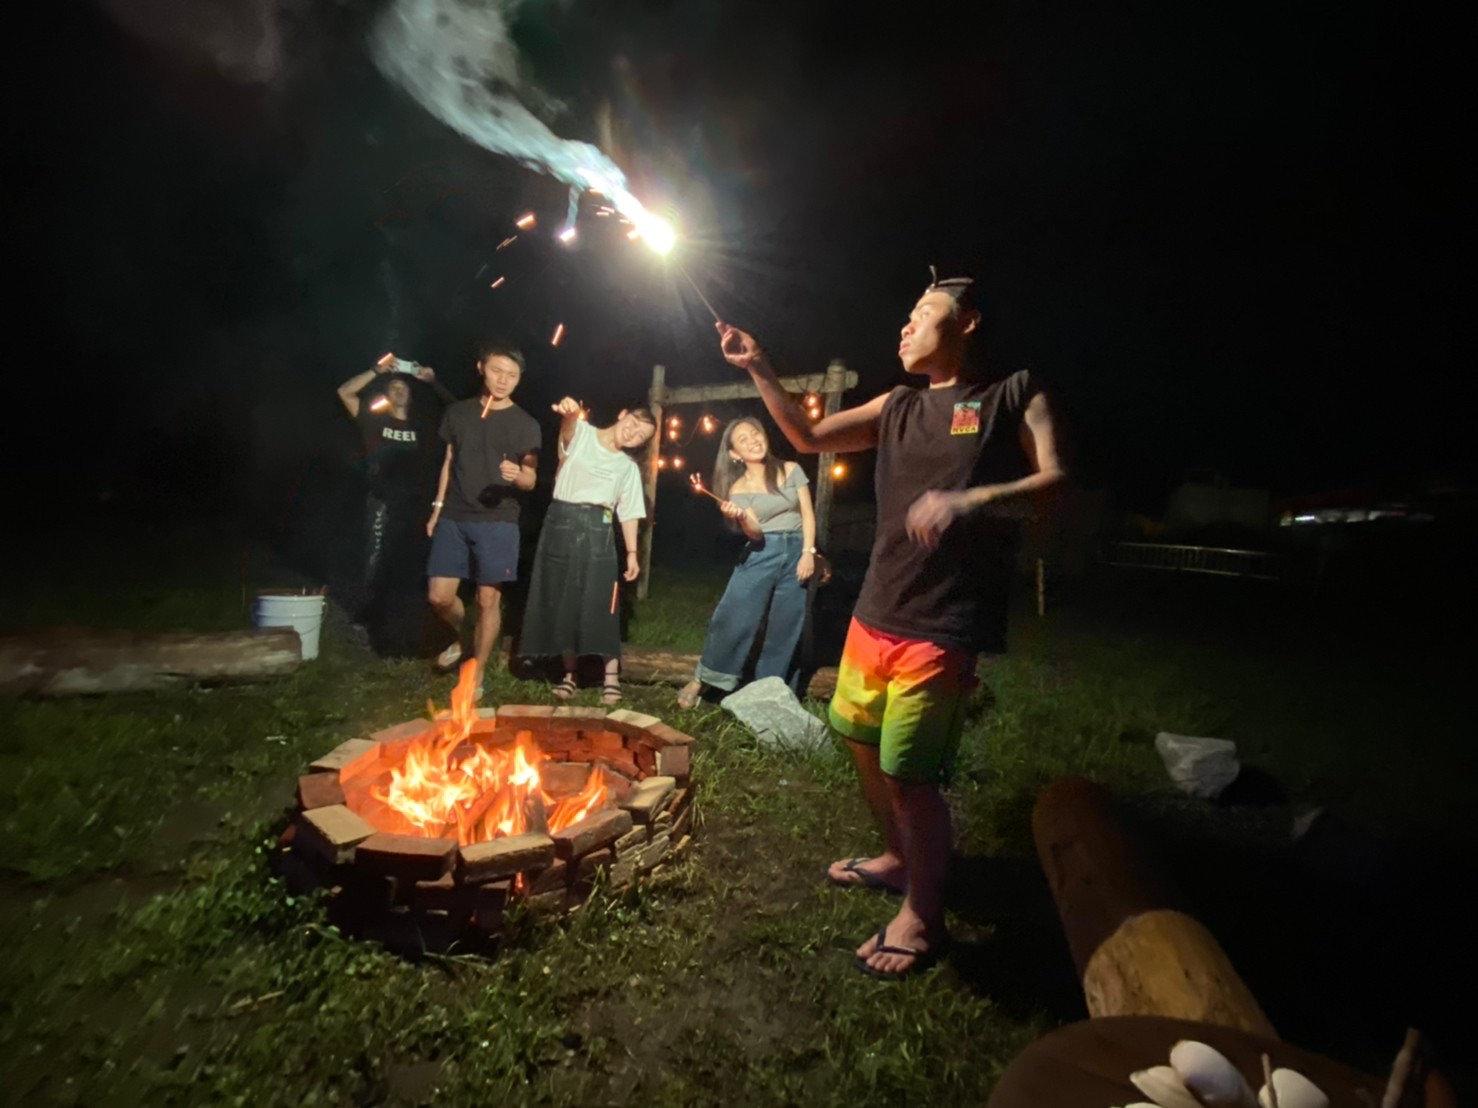 Night BBQ Plan 18:30~21:30(3h)